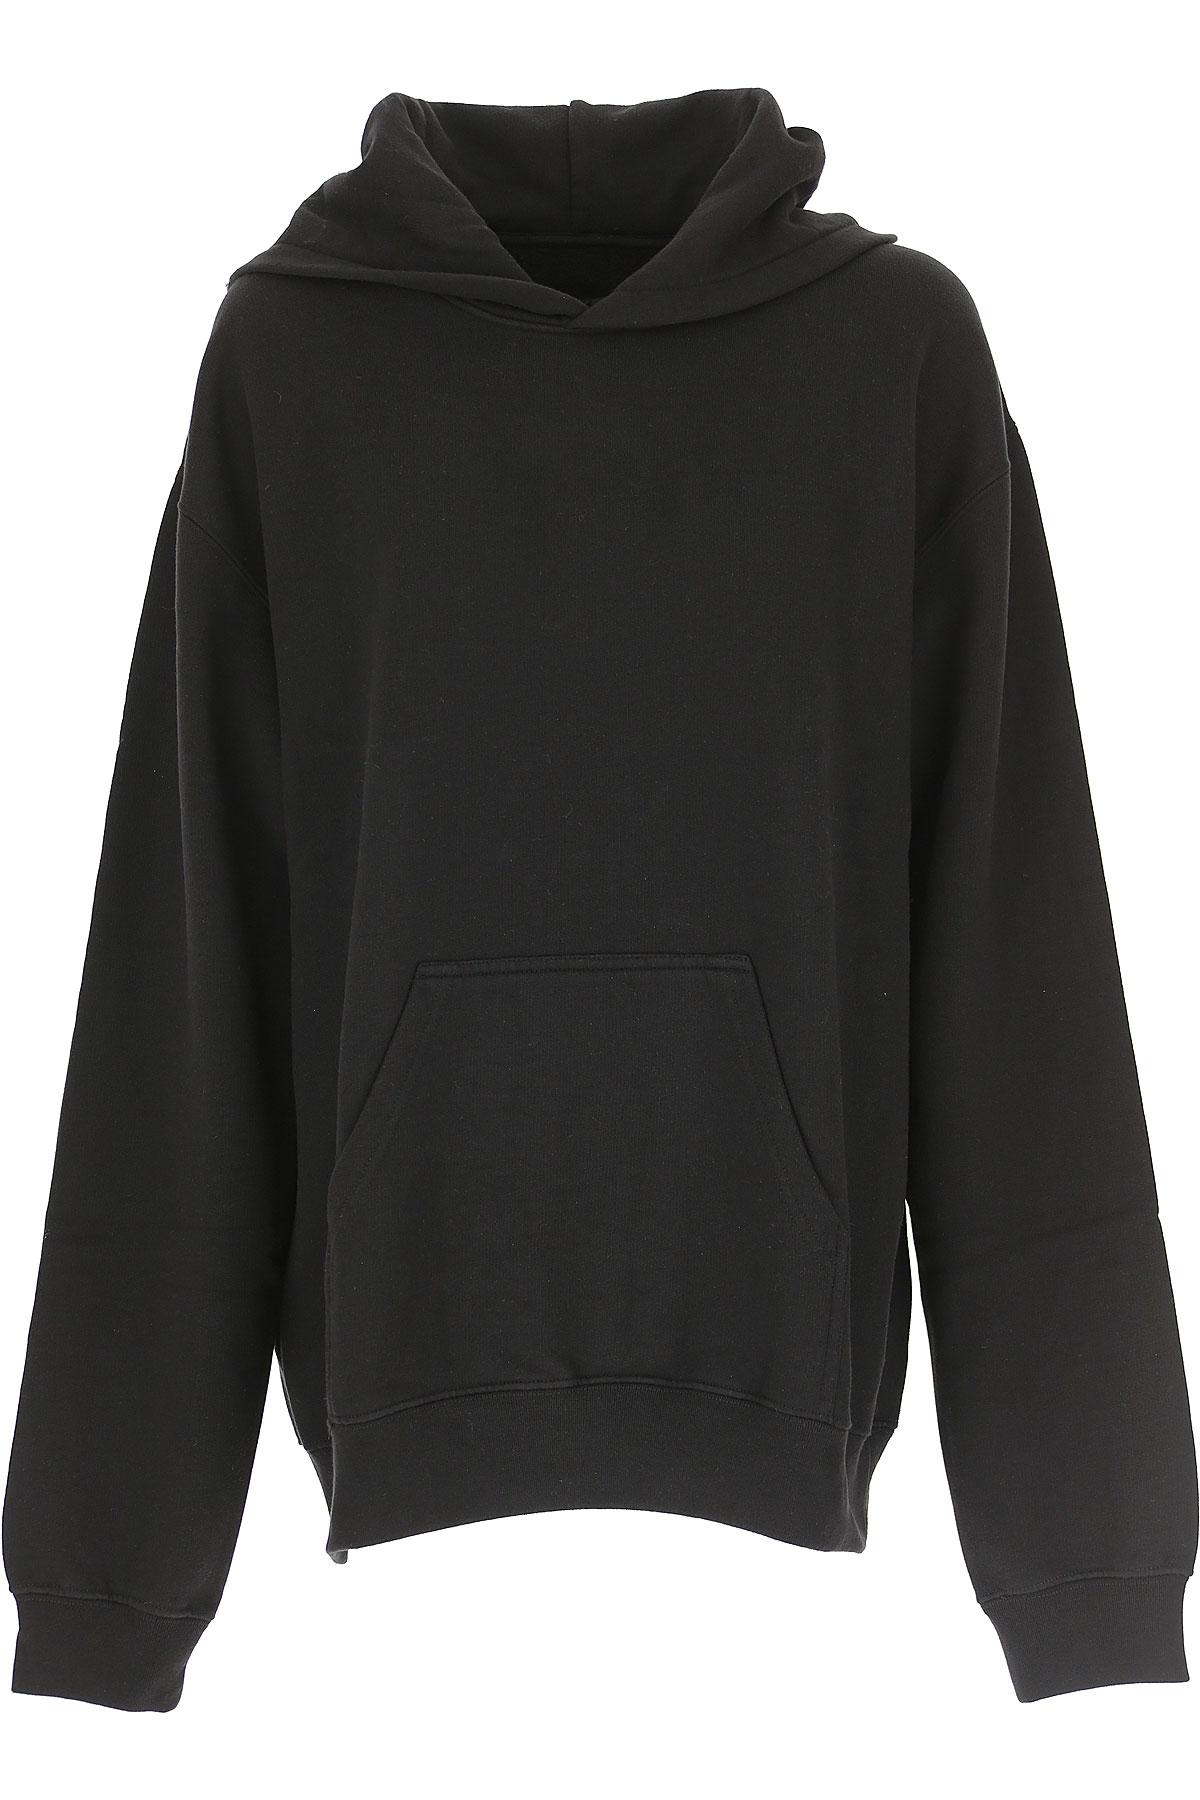 Image of RtA Sweatshirt for Women, Black, Cotton, 2017, 2 4